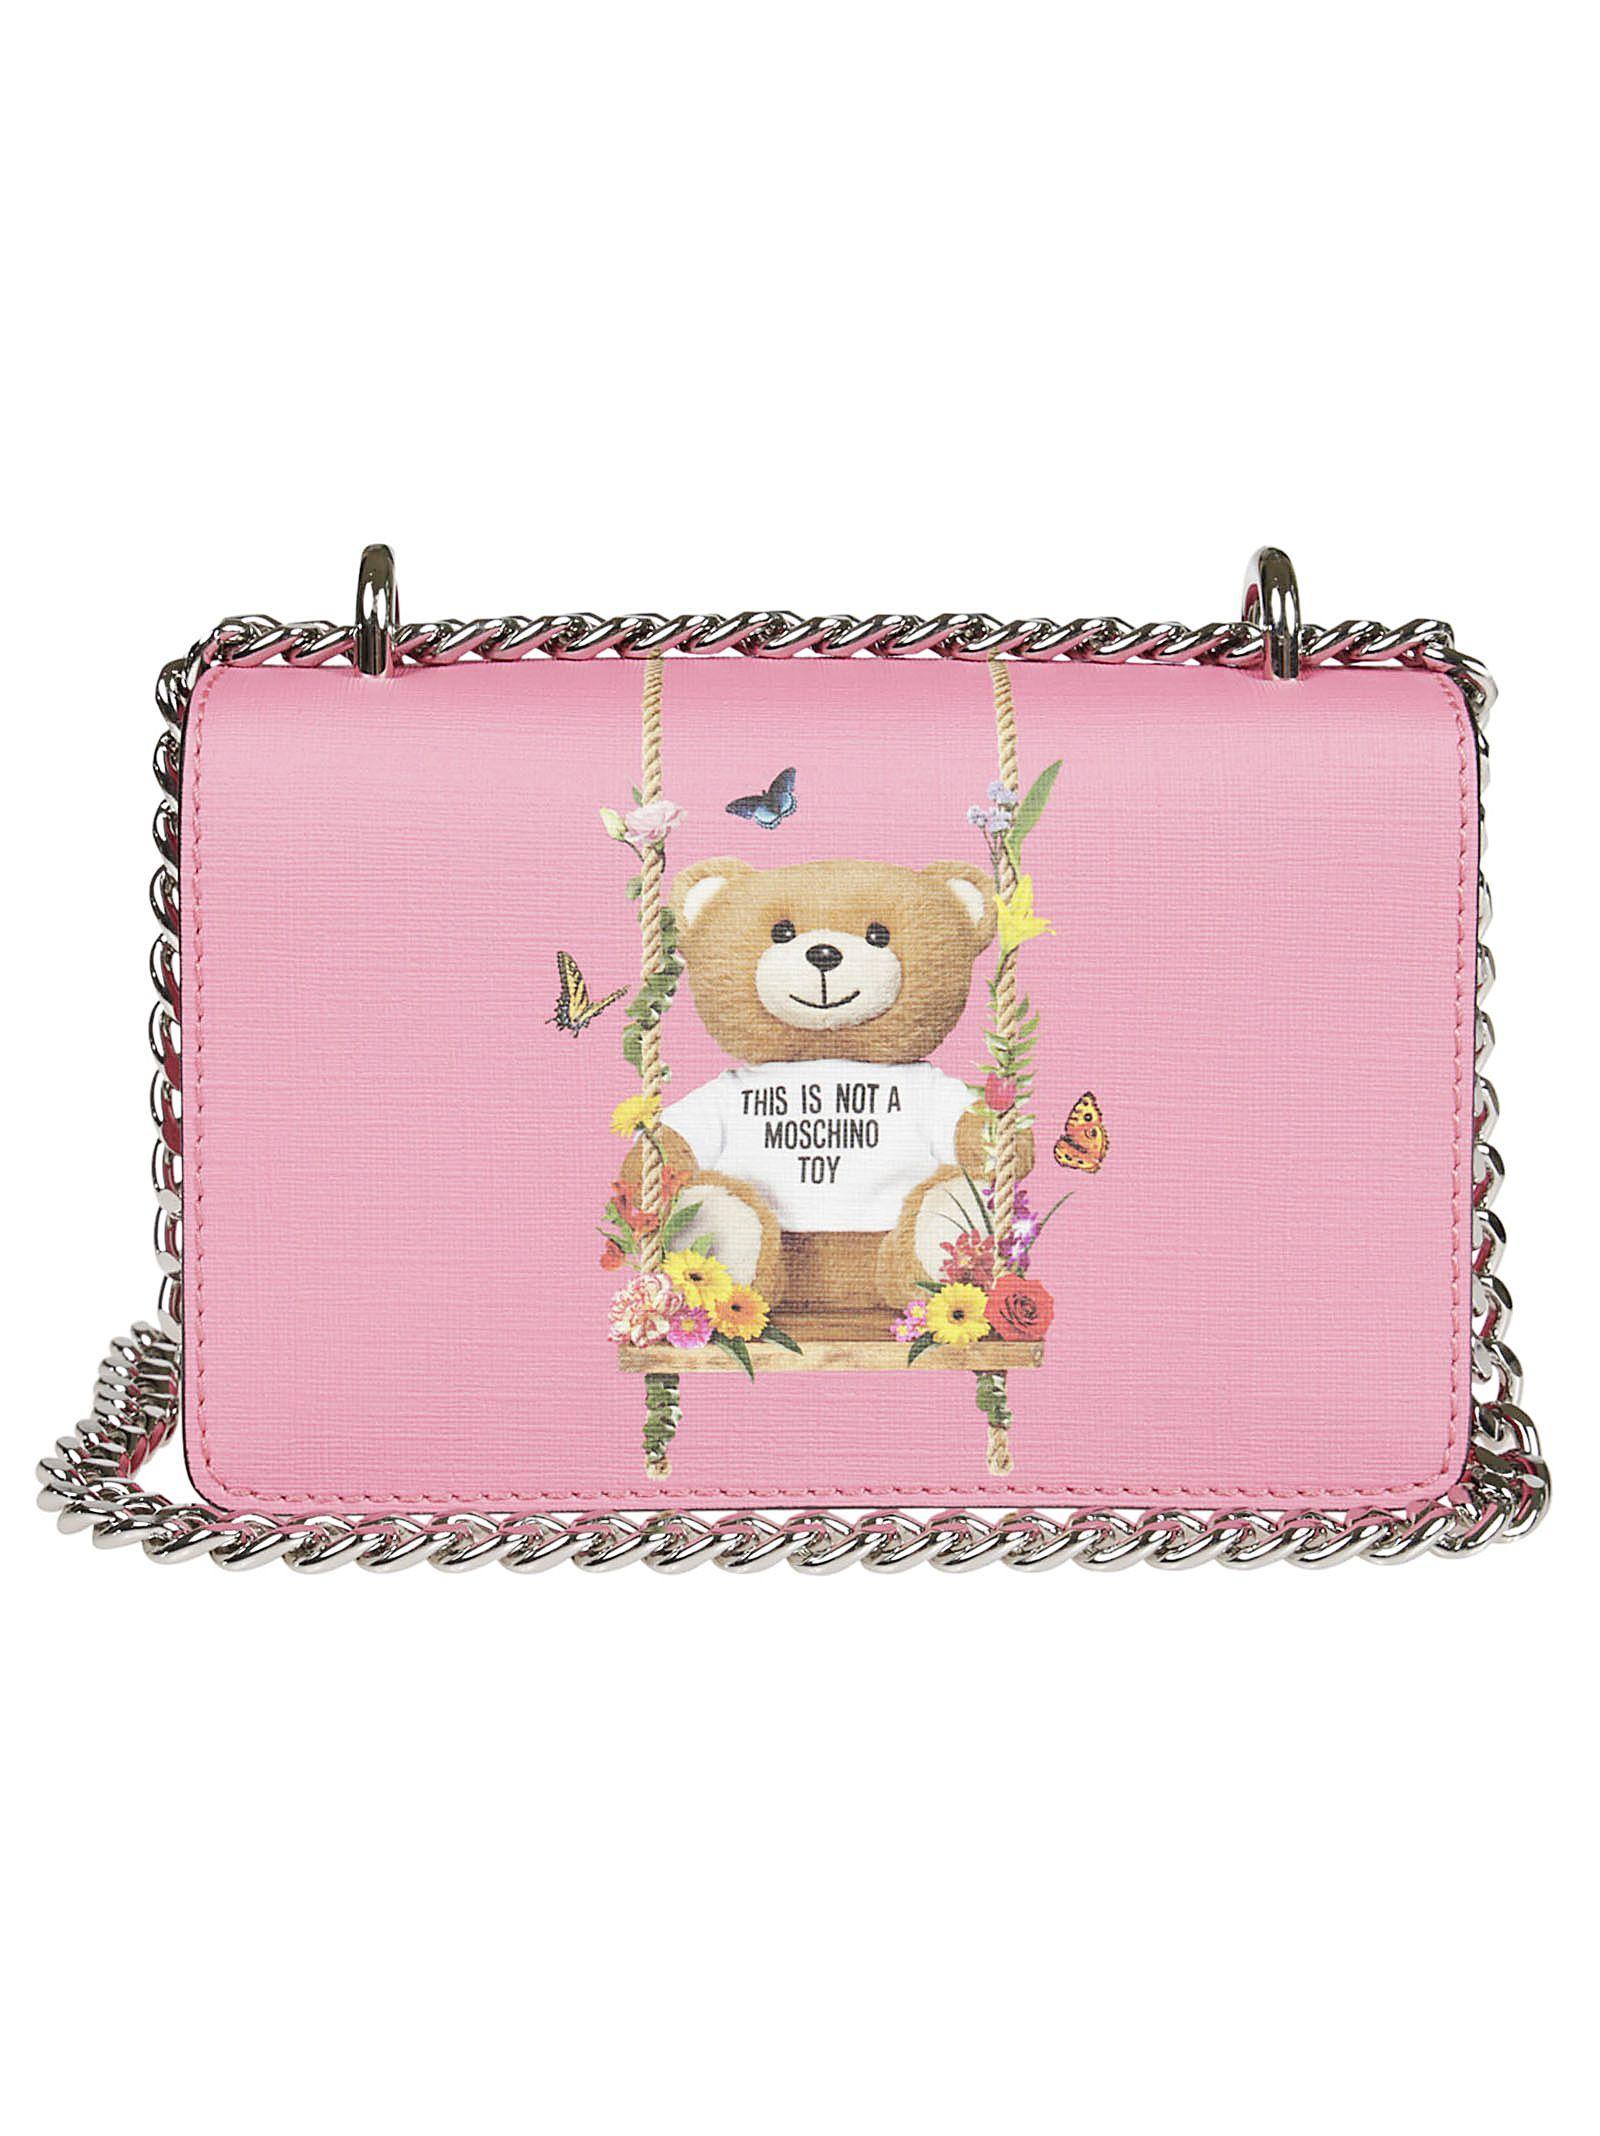 Teddy Shoulder Bag in Pink Calfskin Moschino 100% Guaranteed Online Lowest Price Sale Online oLMYnTZEP